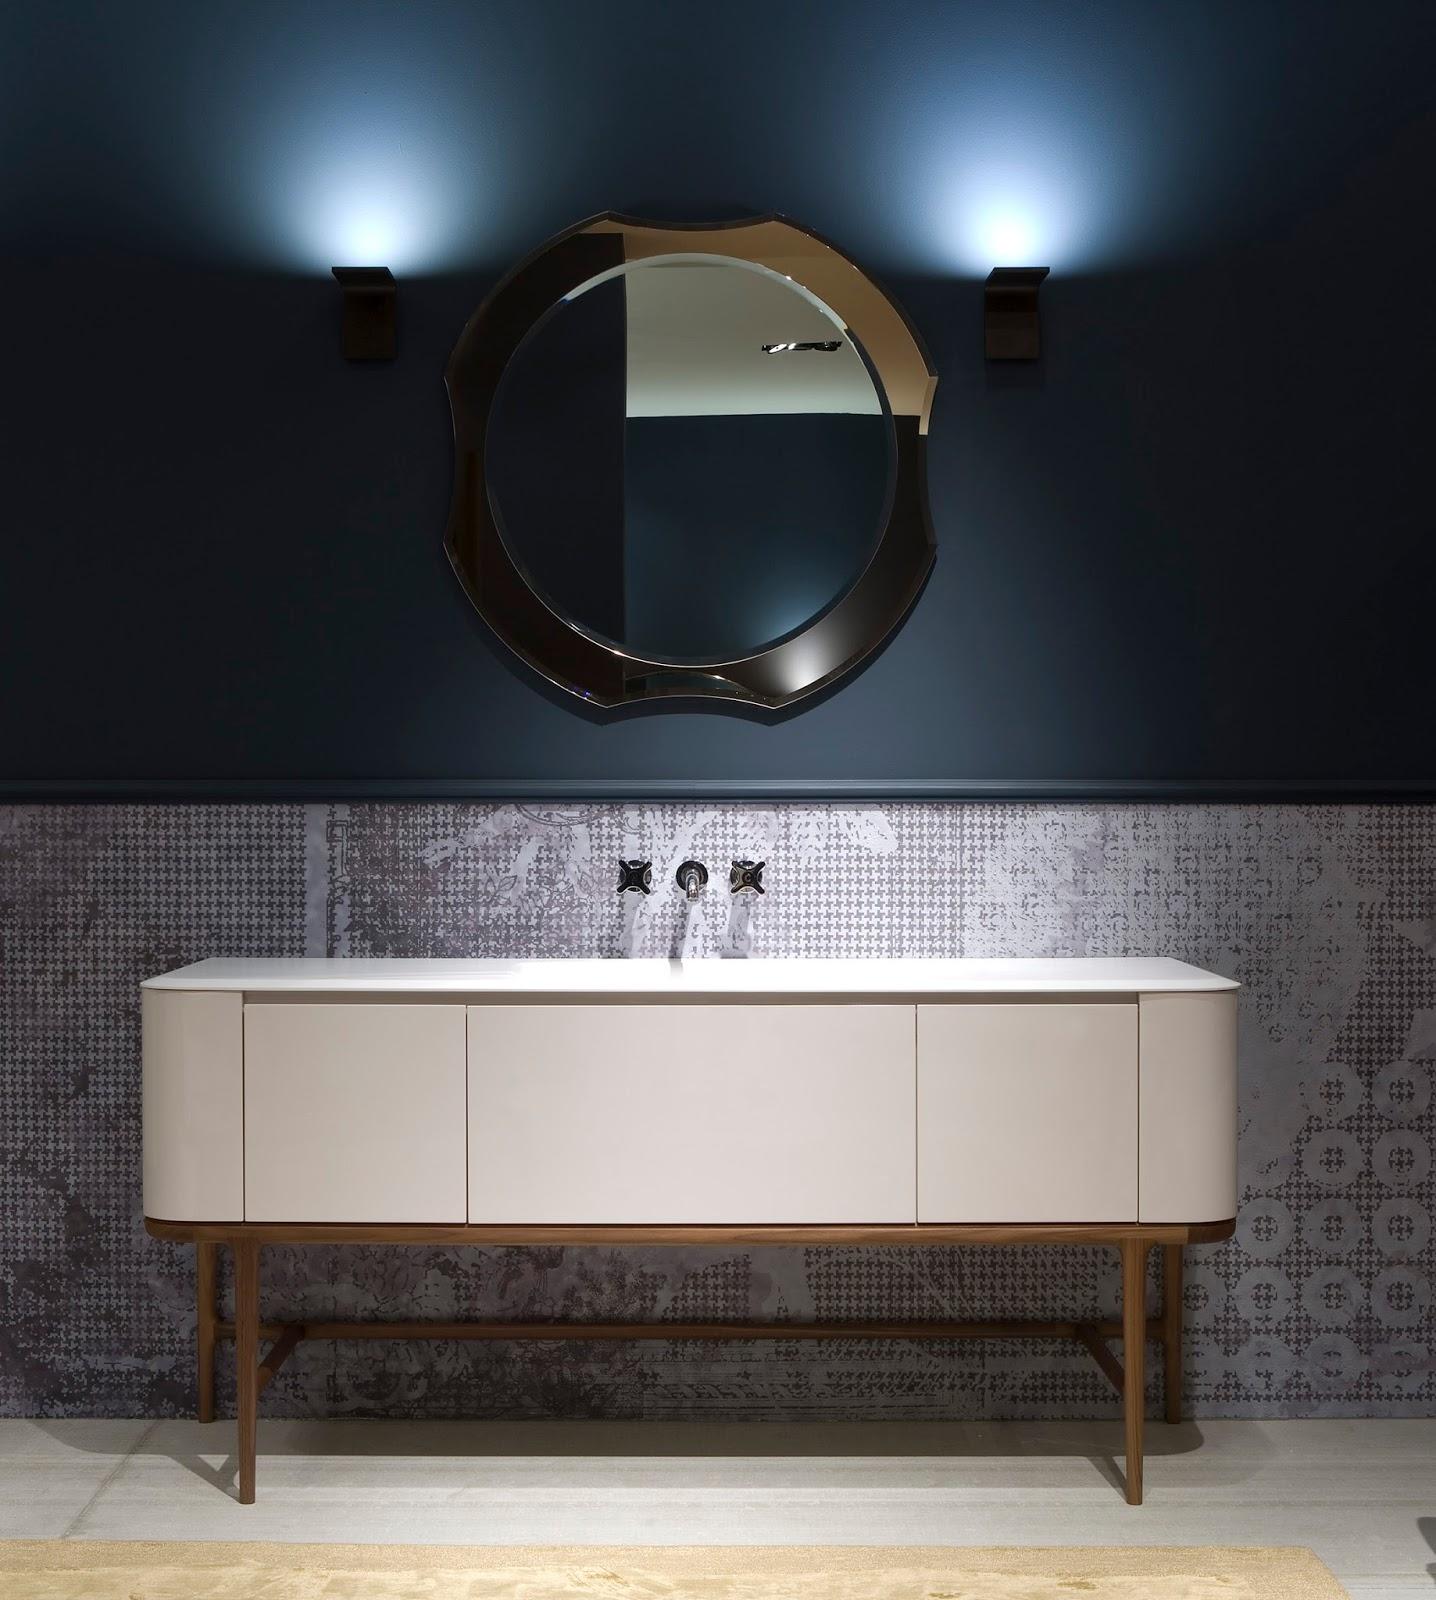 minosa antonio lupi now available at minosa. Black Bedroom Furniture Sets. Home Design Ideas